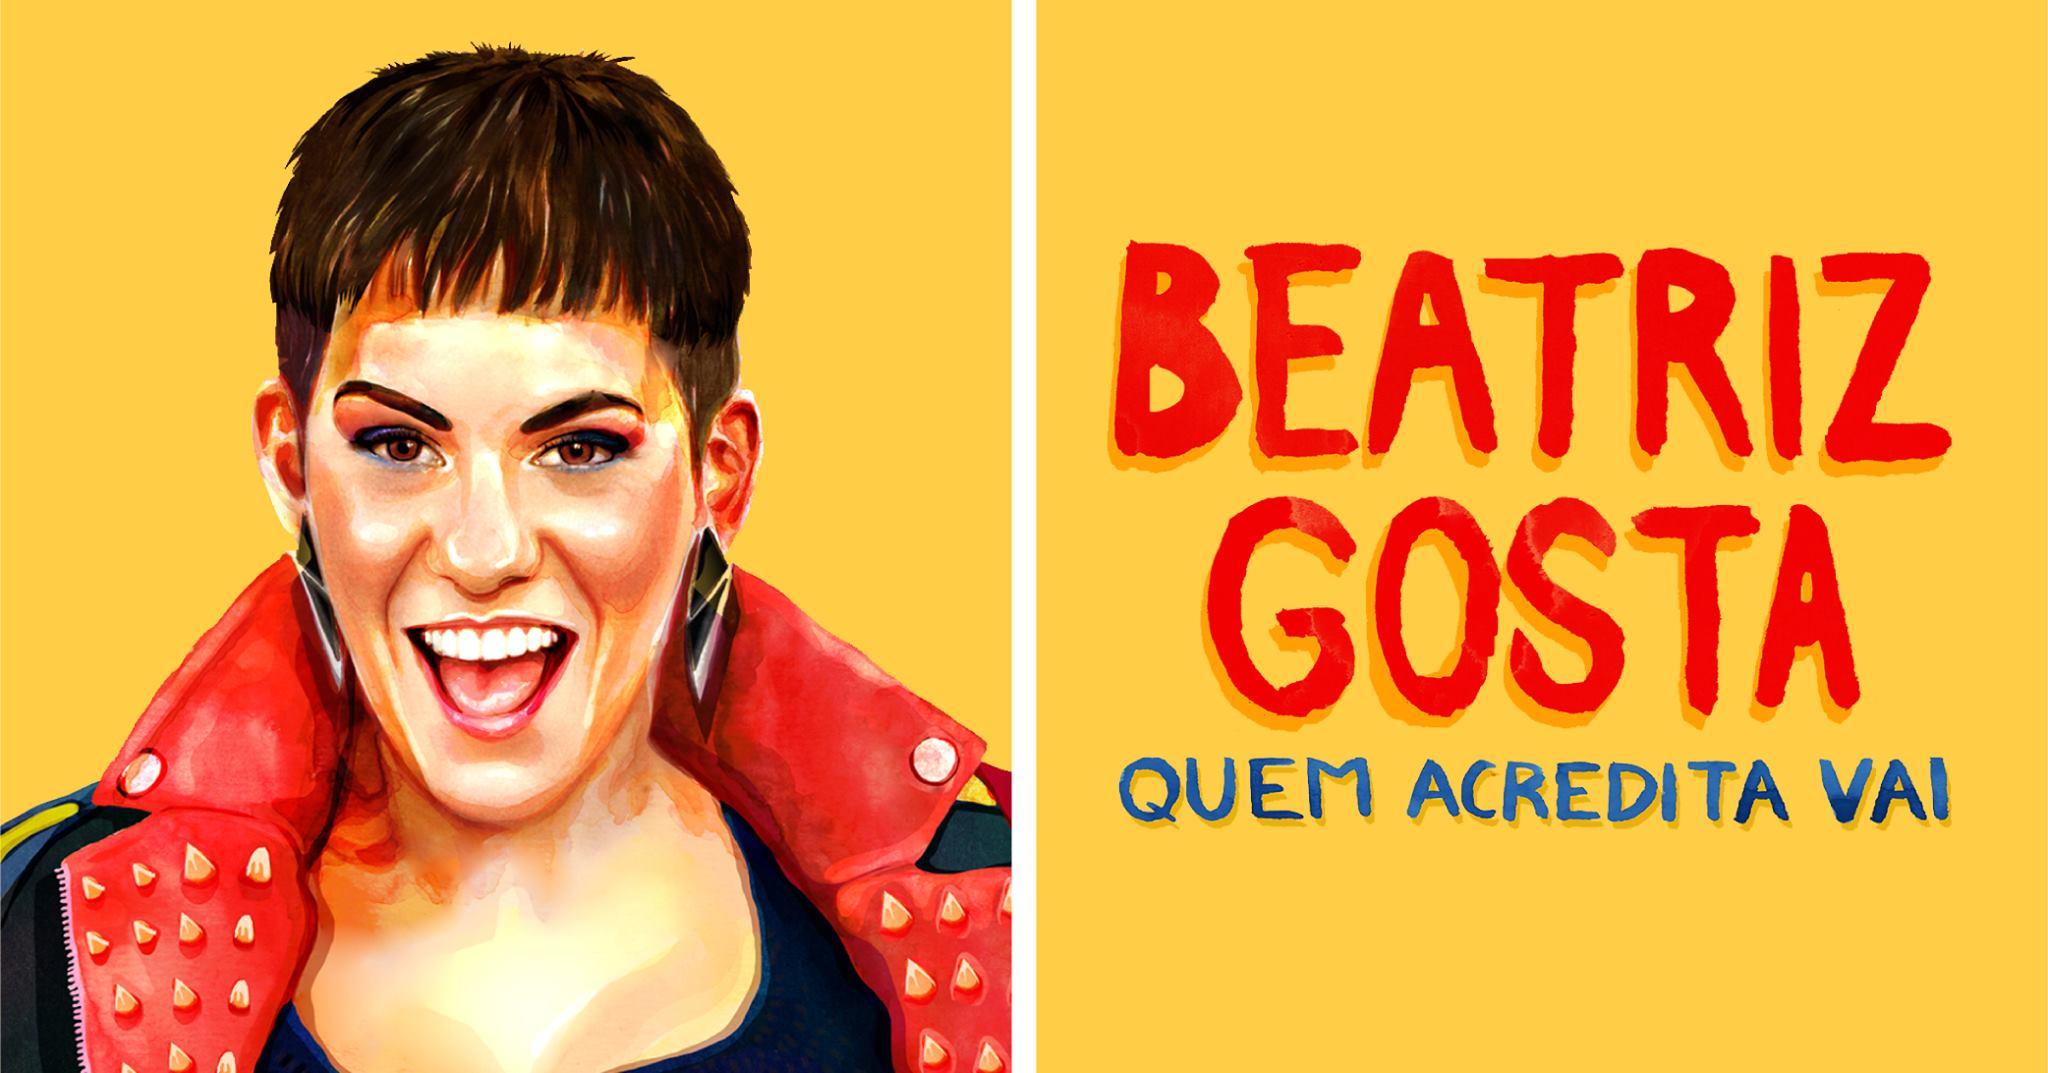 Beatriz Gosta - Quem Acredita Vai | Oliveira de Azeméis